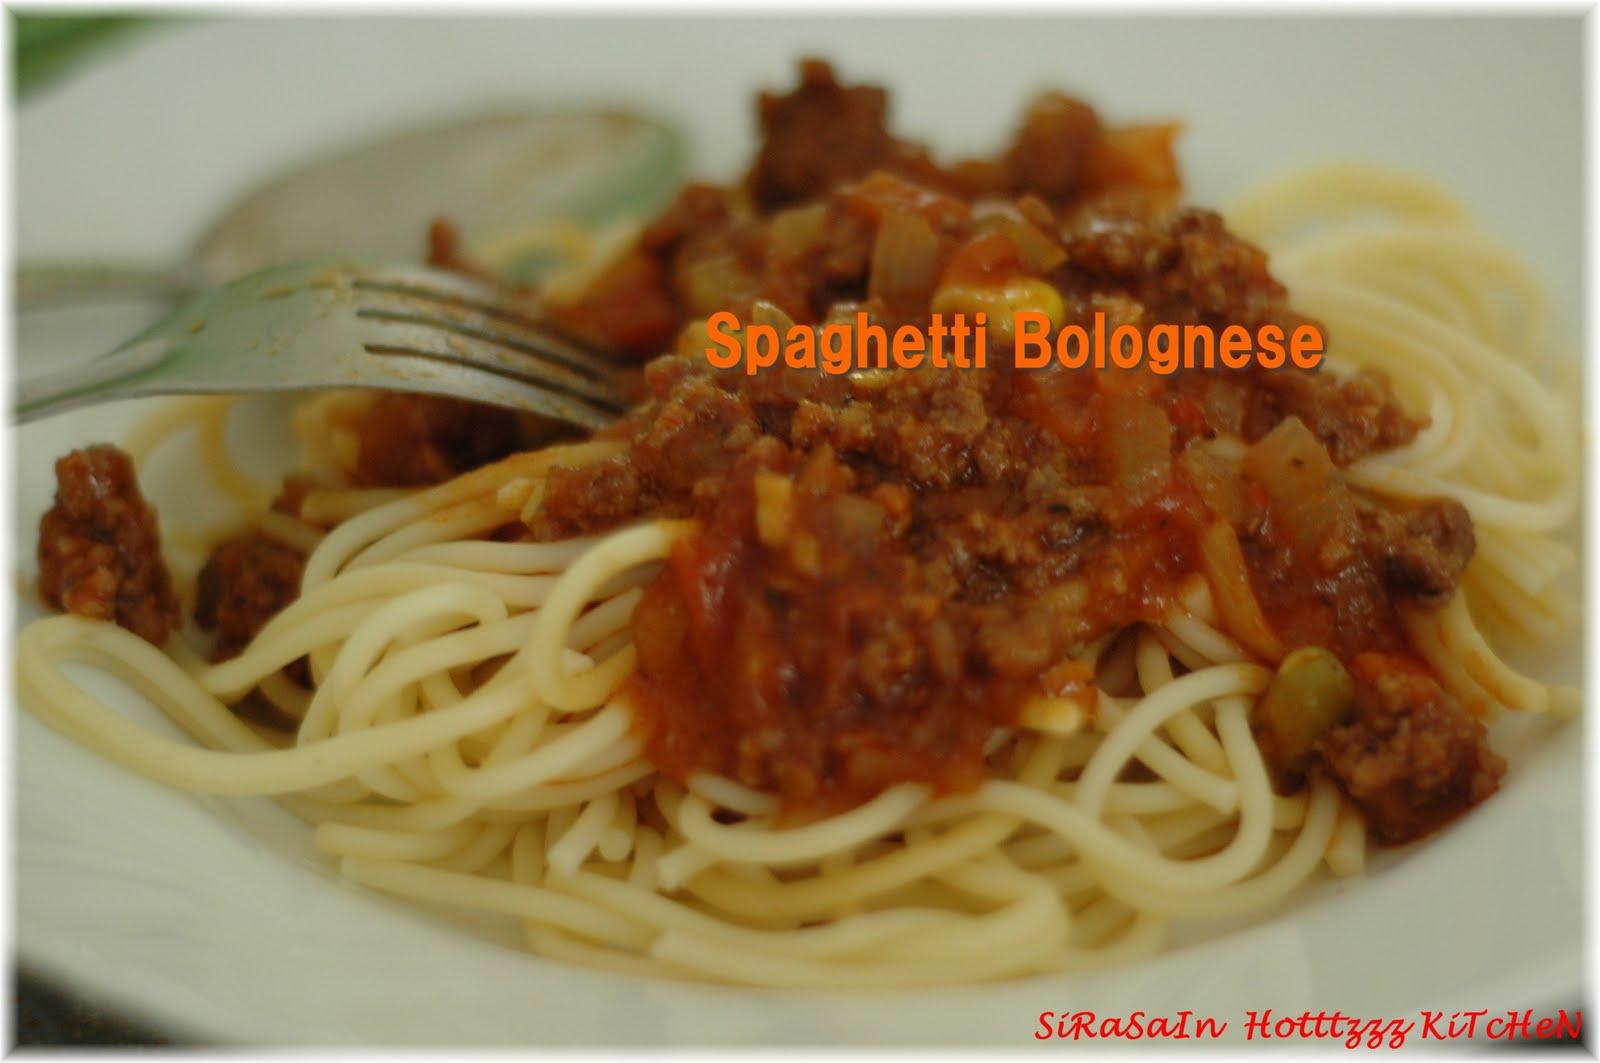 ... HoTtTzZz KiTcHeN CeNtRe(SSHKC): Tip menyedapkan Spageti Bolognese